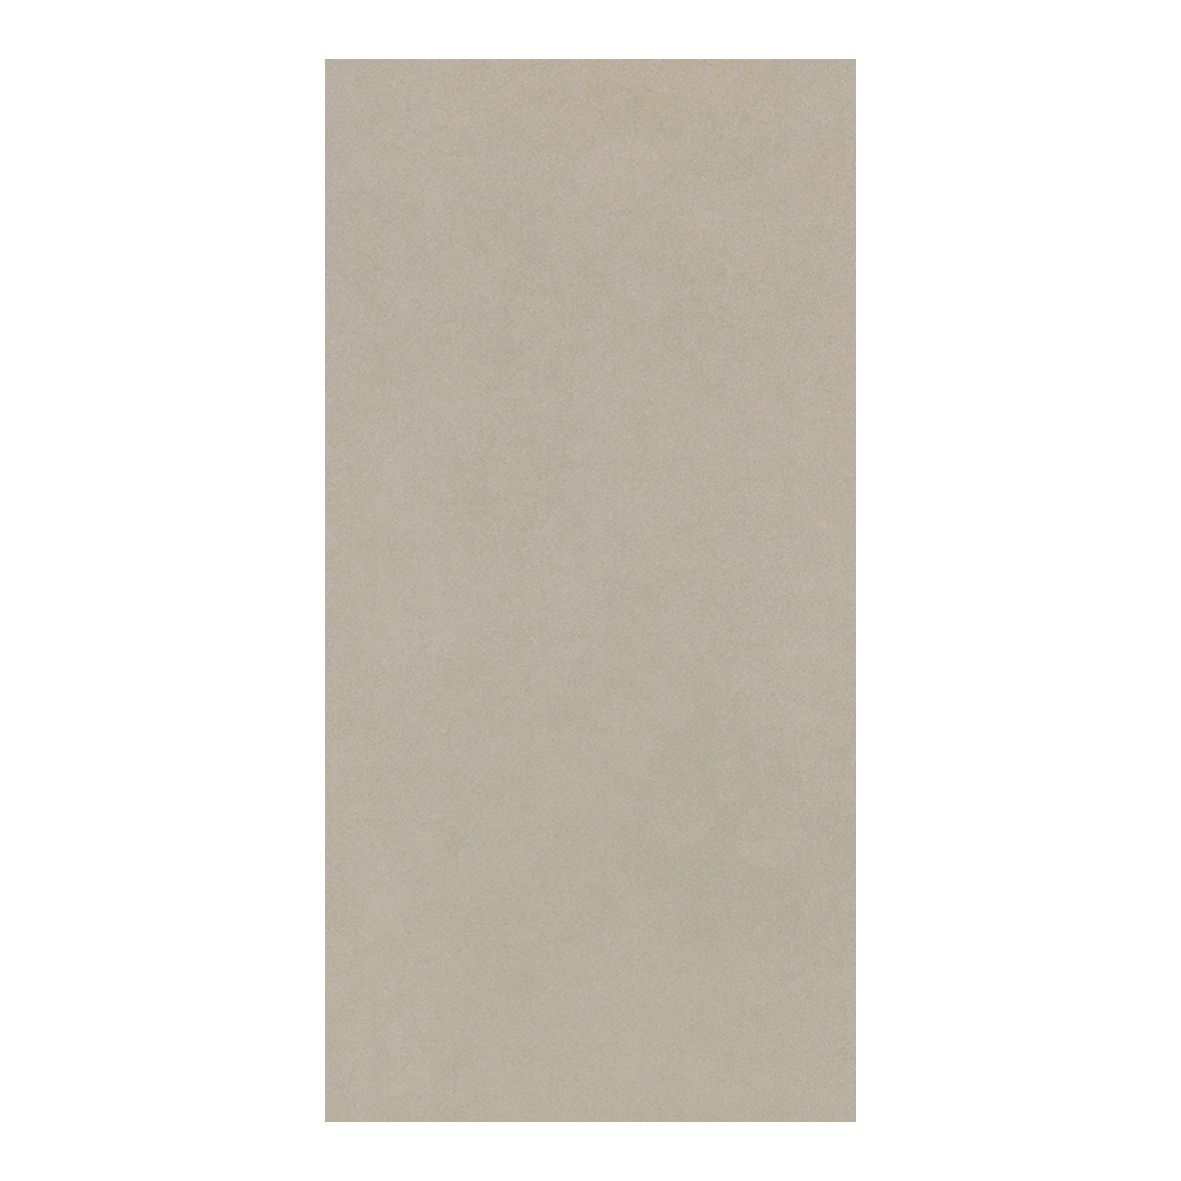 Earth Grey Tile, Rectified | Bathroom, Kitchen Tiles | Gemini Tiles ...